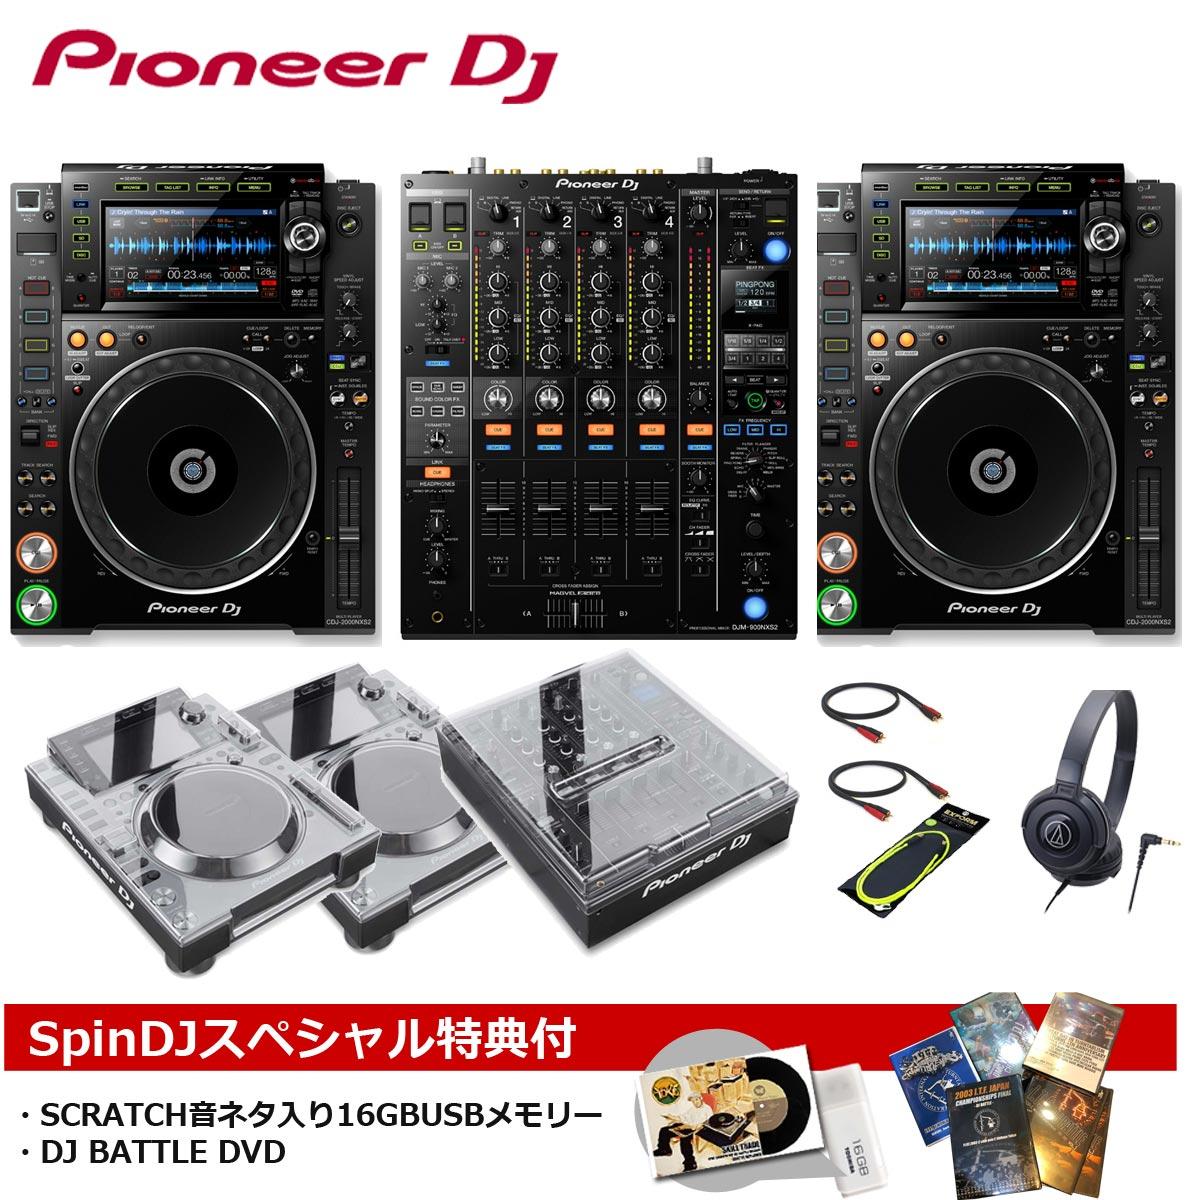 Pioneer DJ / CDJ-2000NXS2 + DJM-900NXS2 SET【豪華2大特典付き!】【お取り寄せ商品】【渋谷店】